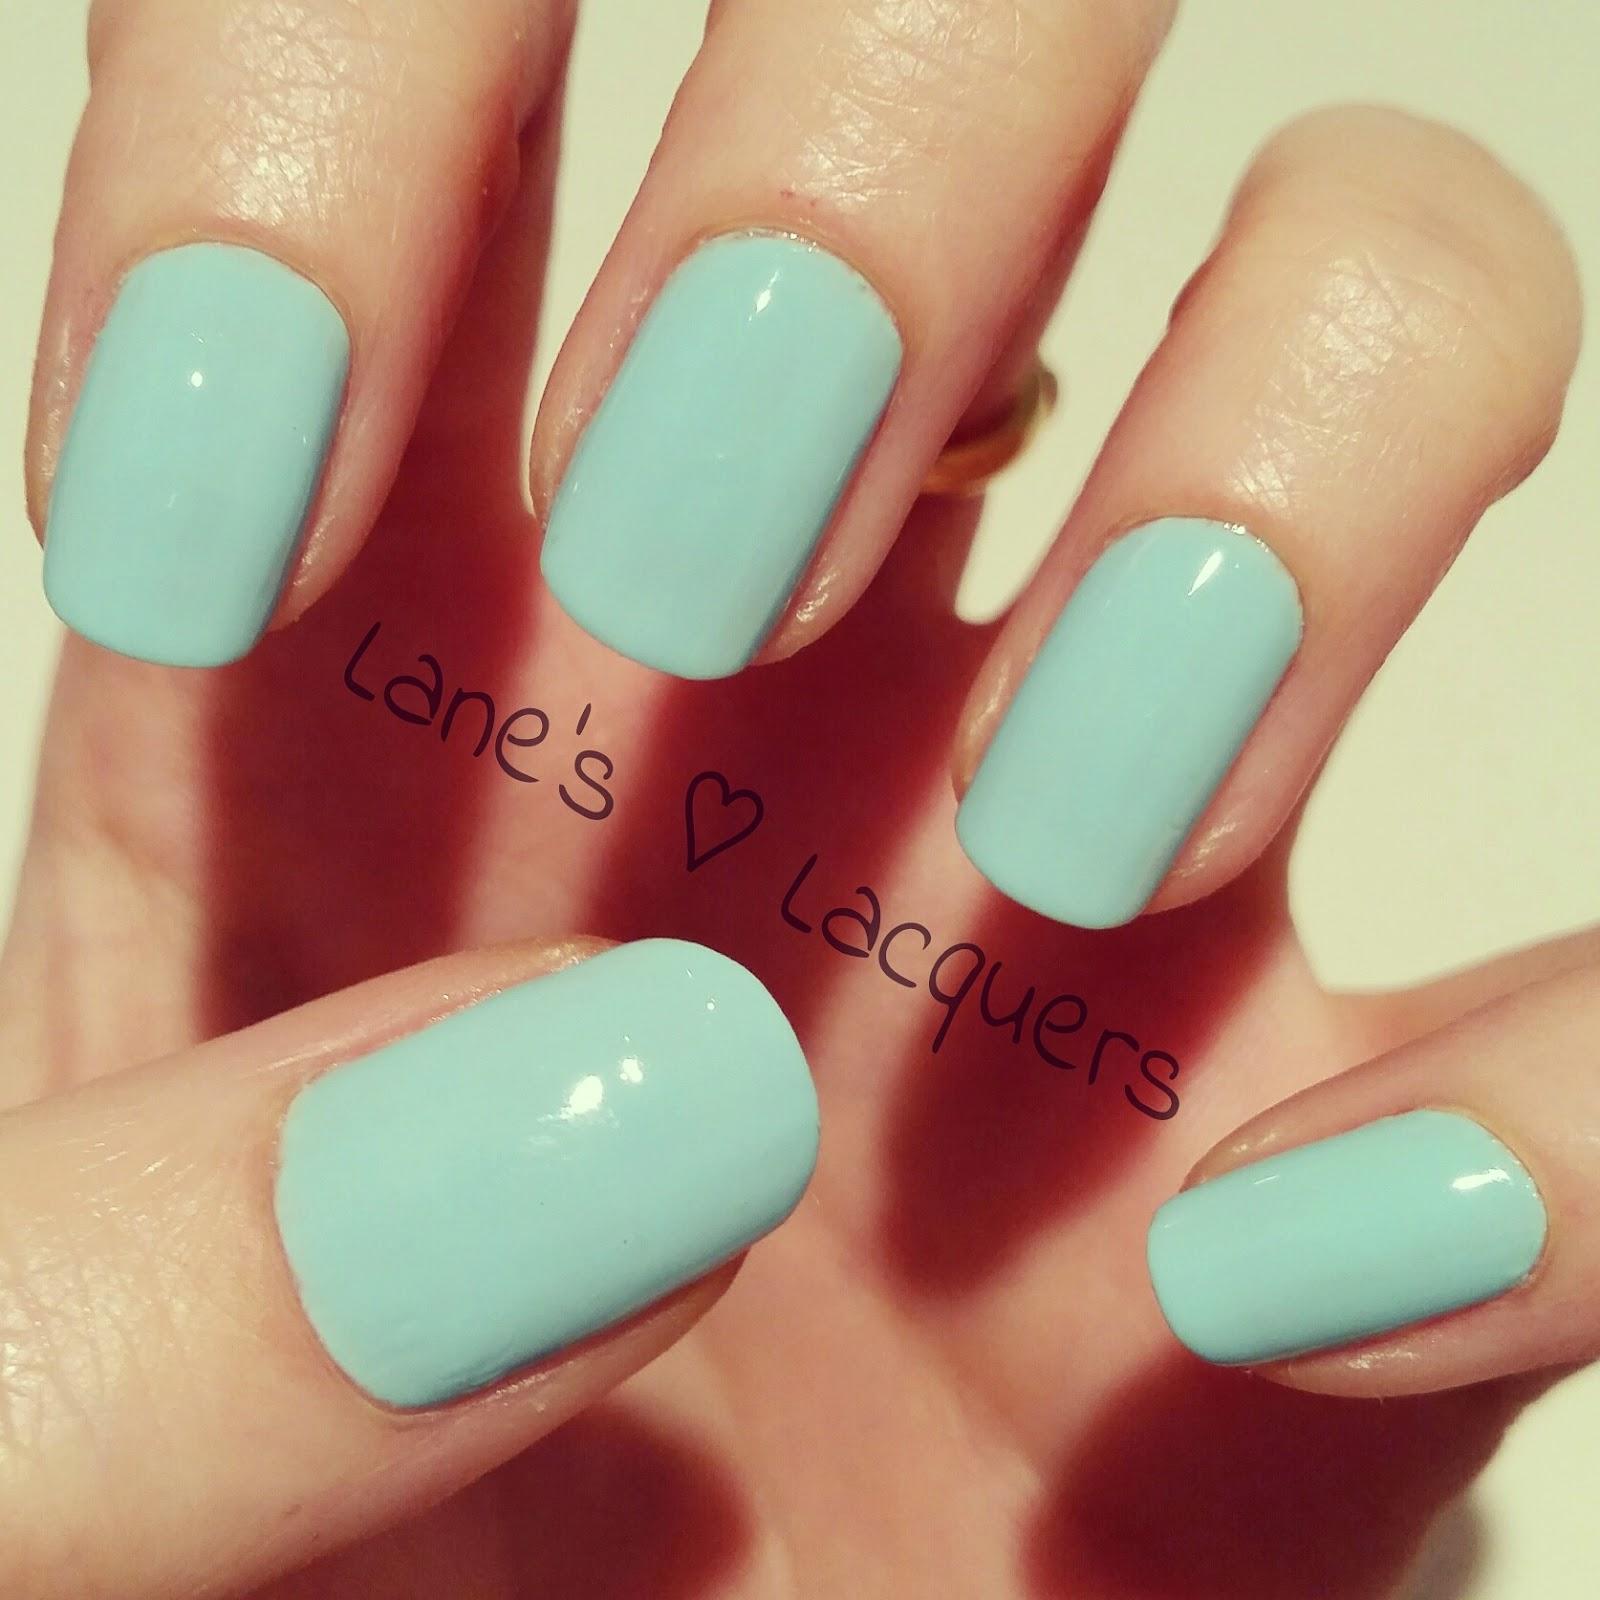 new-barry-m-gelly-sky-blue-swatch-manicure